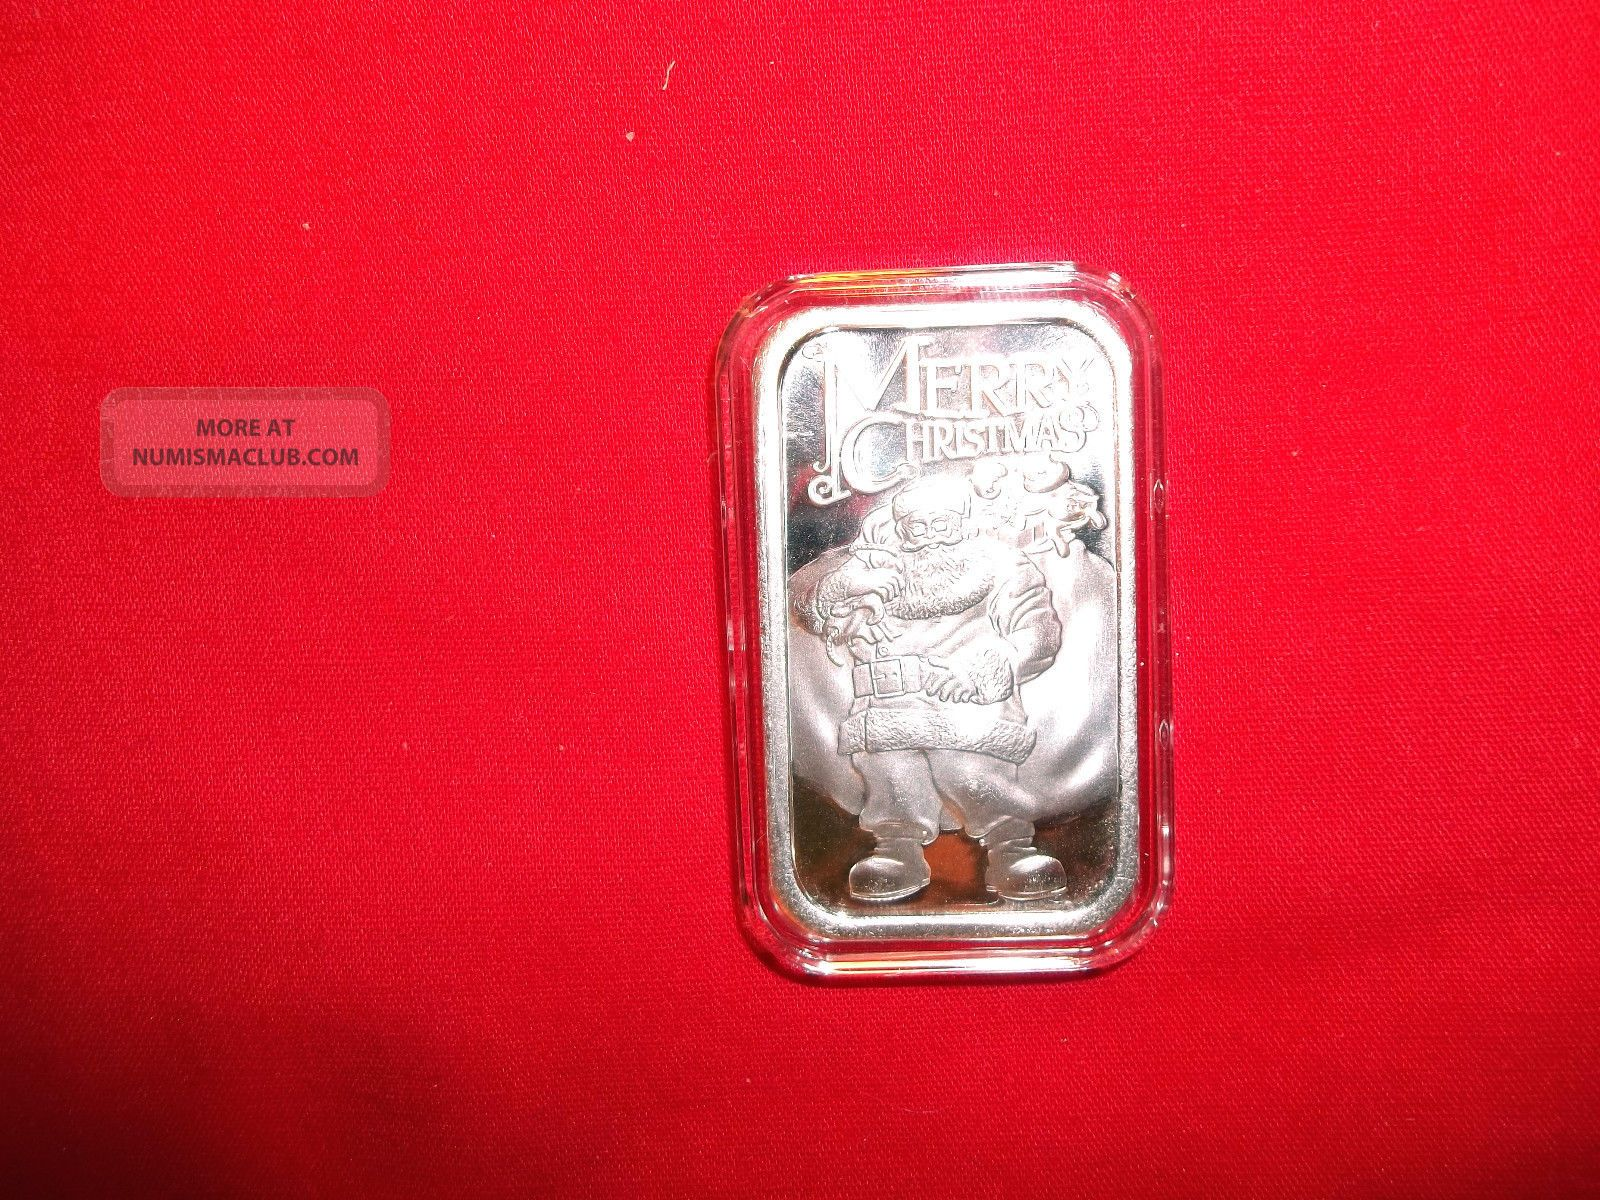 One Ounce 999 Fine Silver Bar Silvertowne Santa